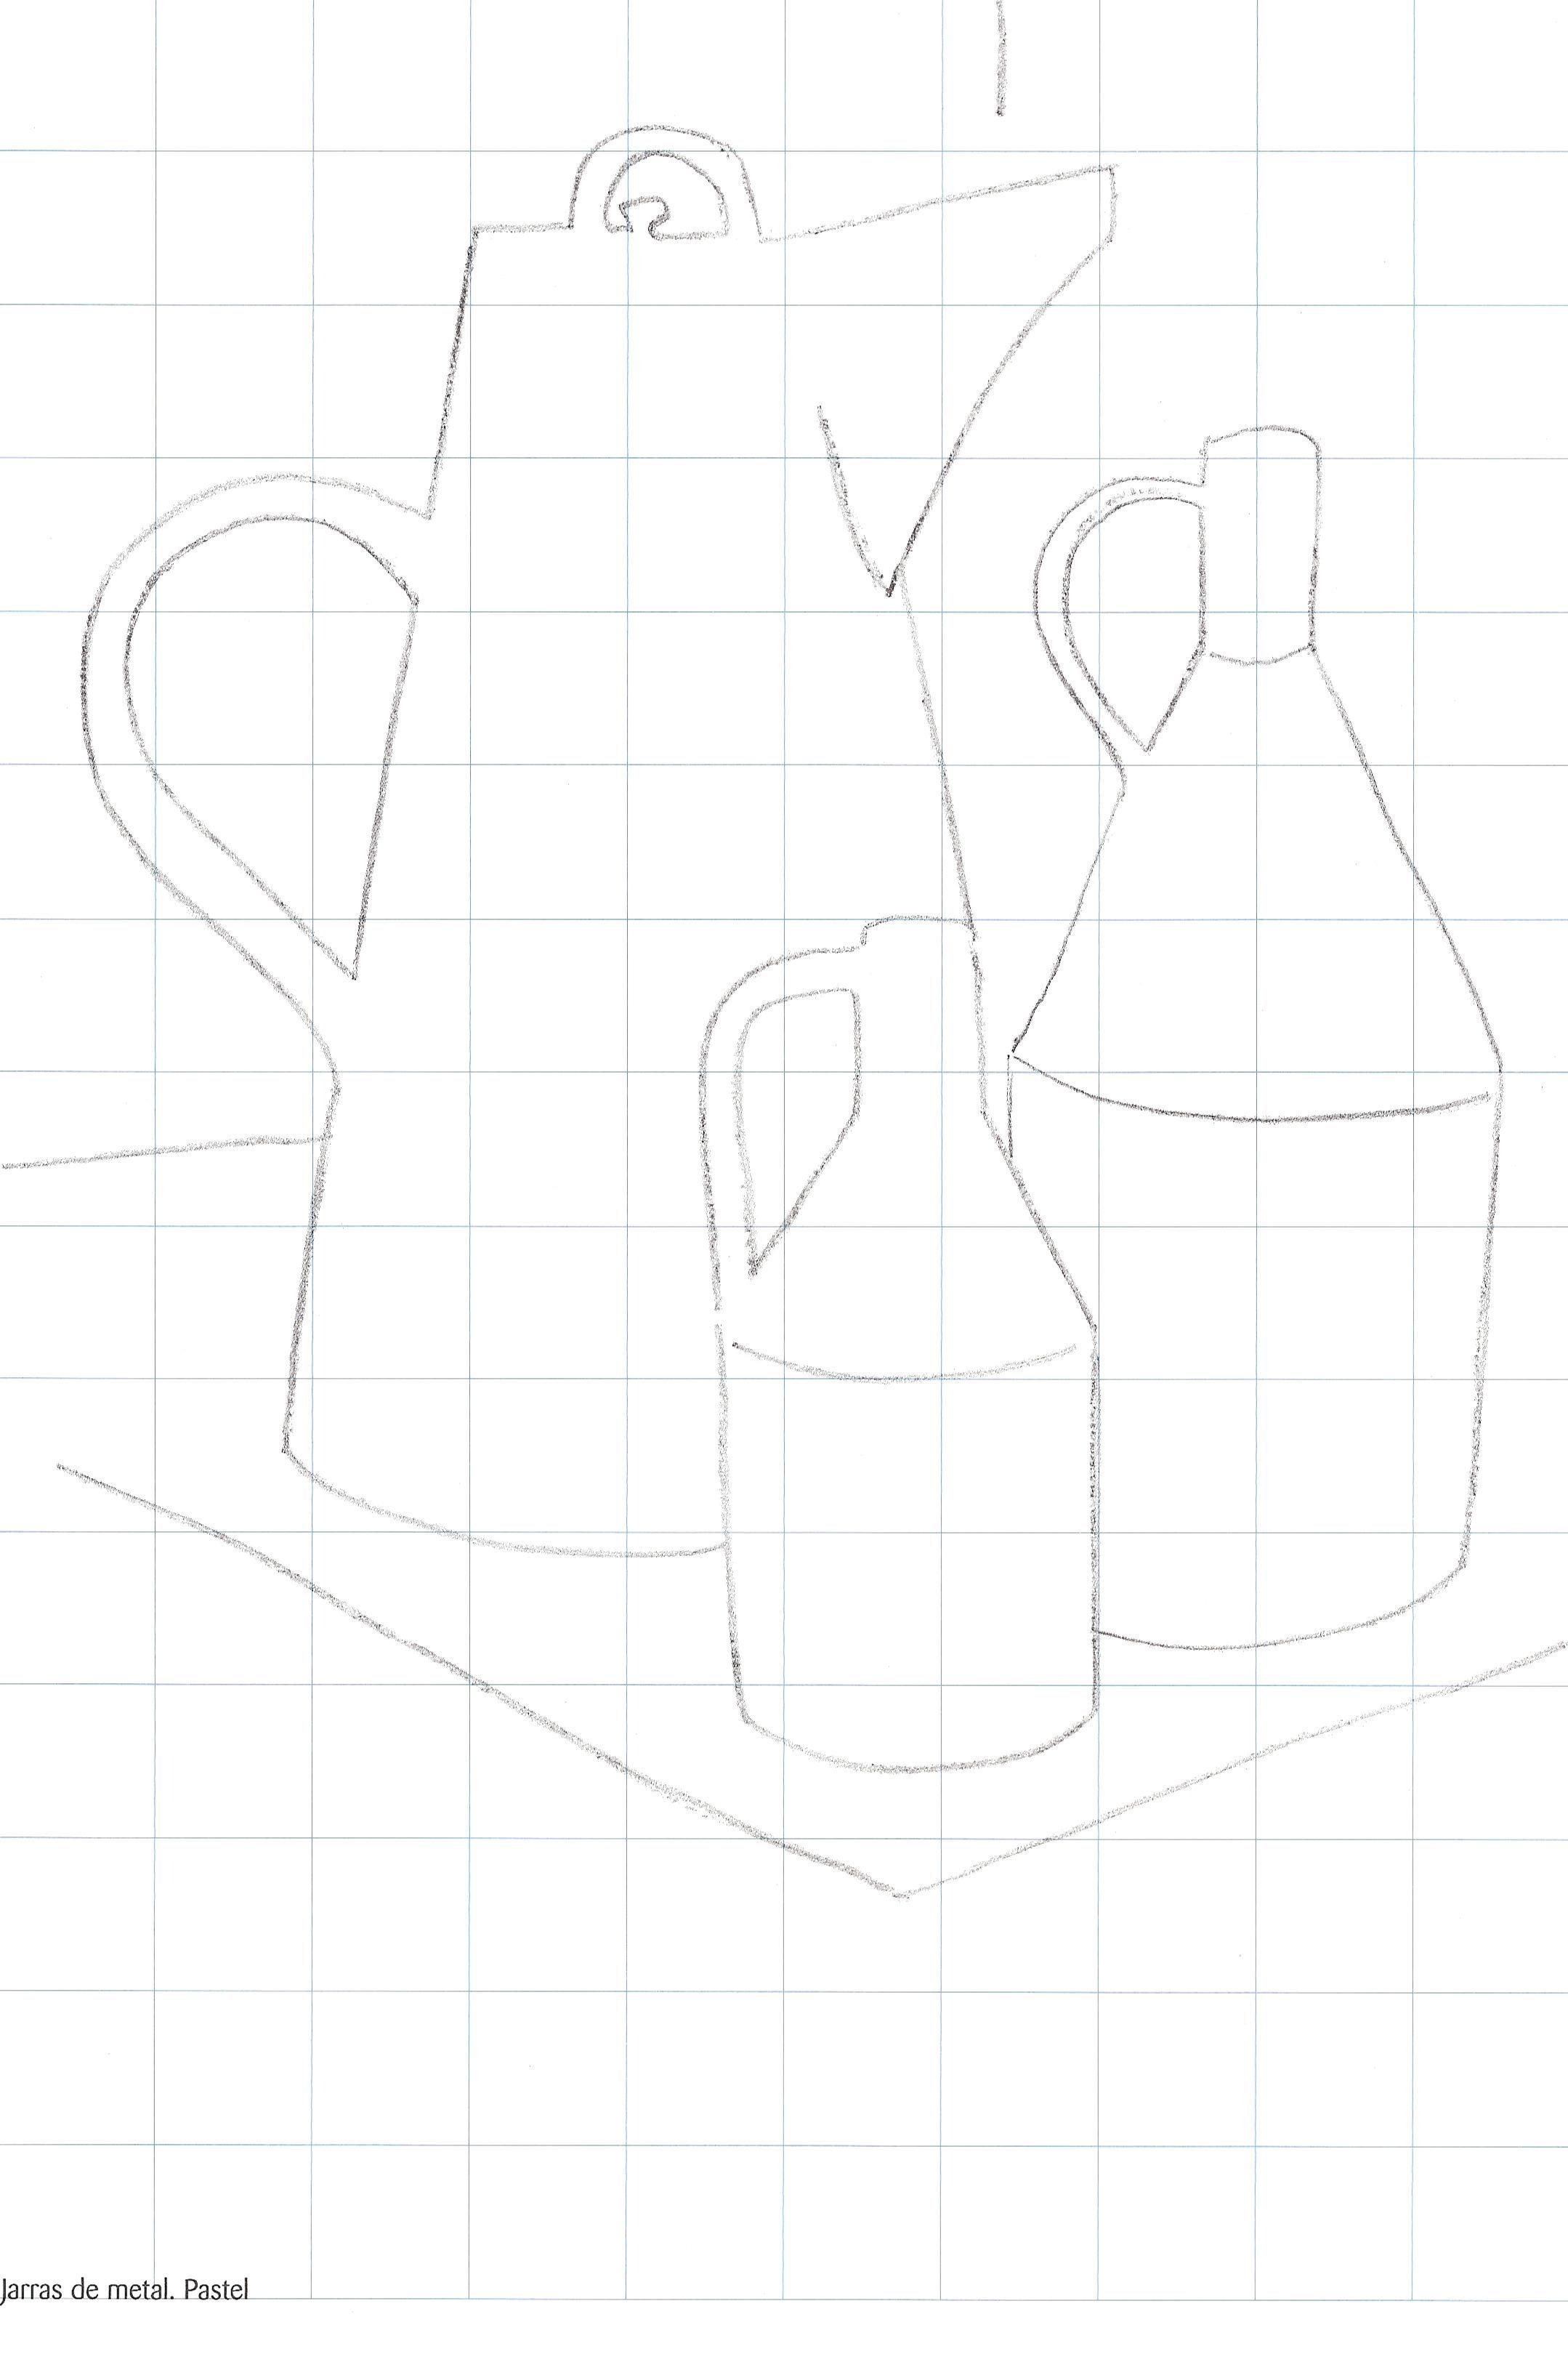 https://dibujos para cuerda seca - Buscar con Google